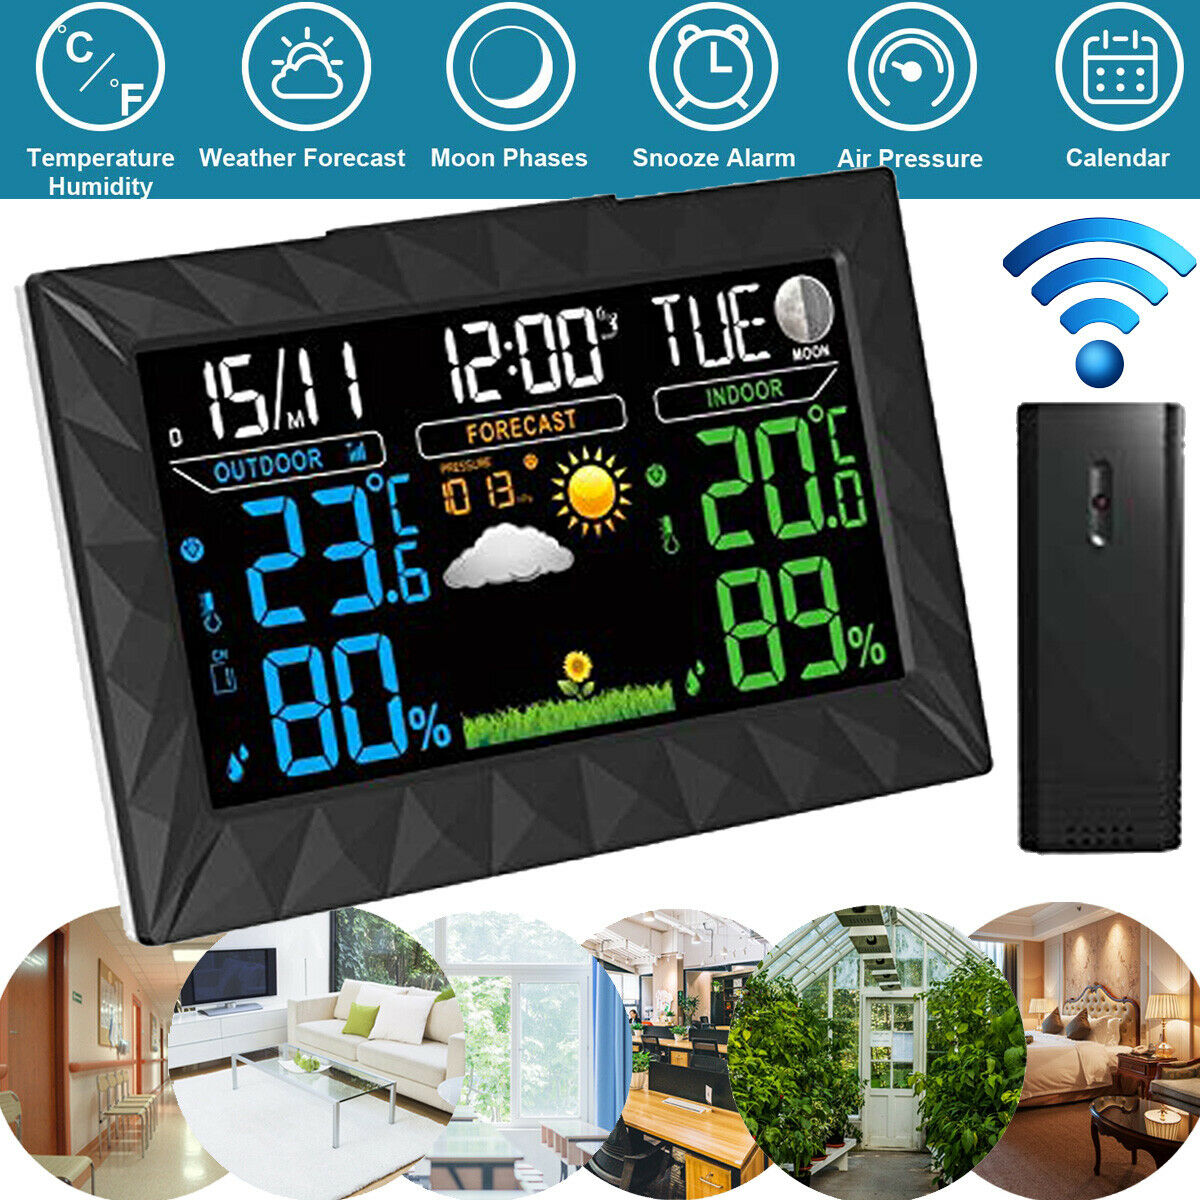 Wetterprognose Weckalaram Funkwetterstation Funkuhr Wecker LCD Farbdisplay